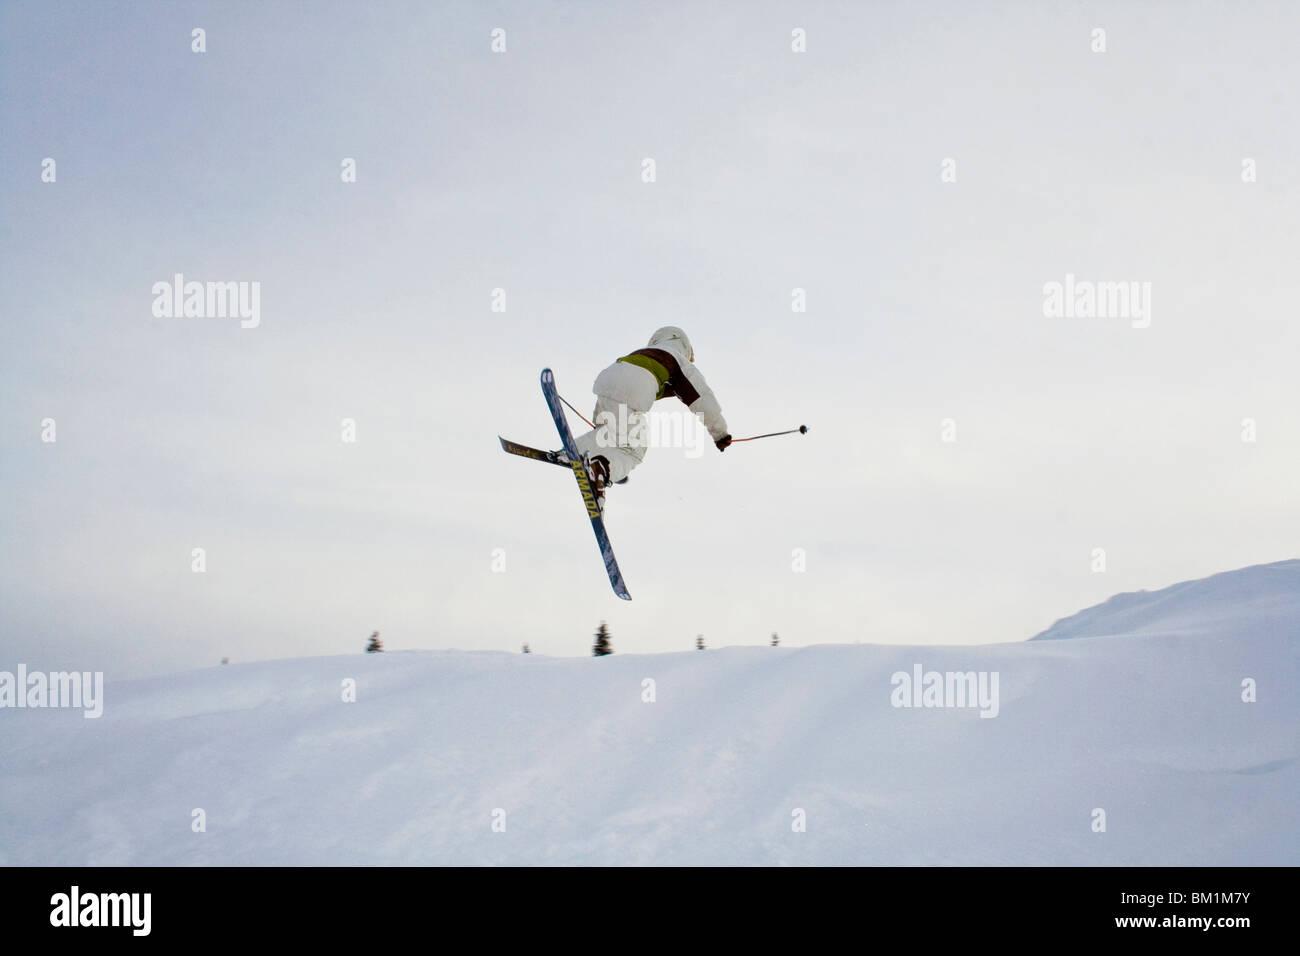 skier in Dunderet ski resort in northern sweden part of the gallivare town - Stock Image